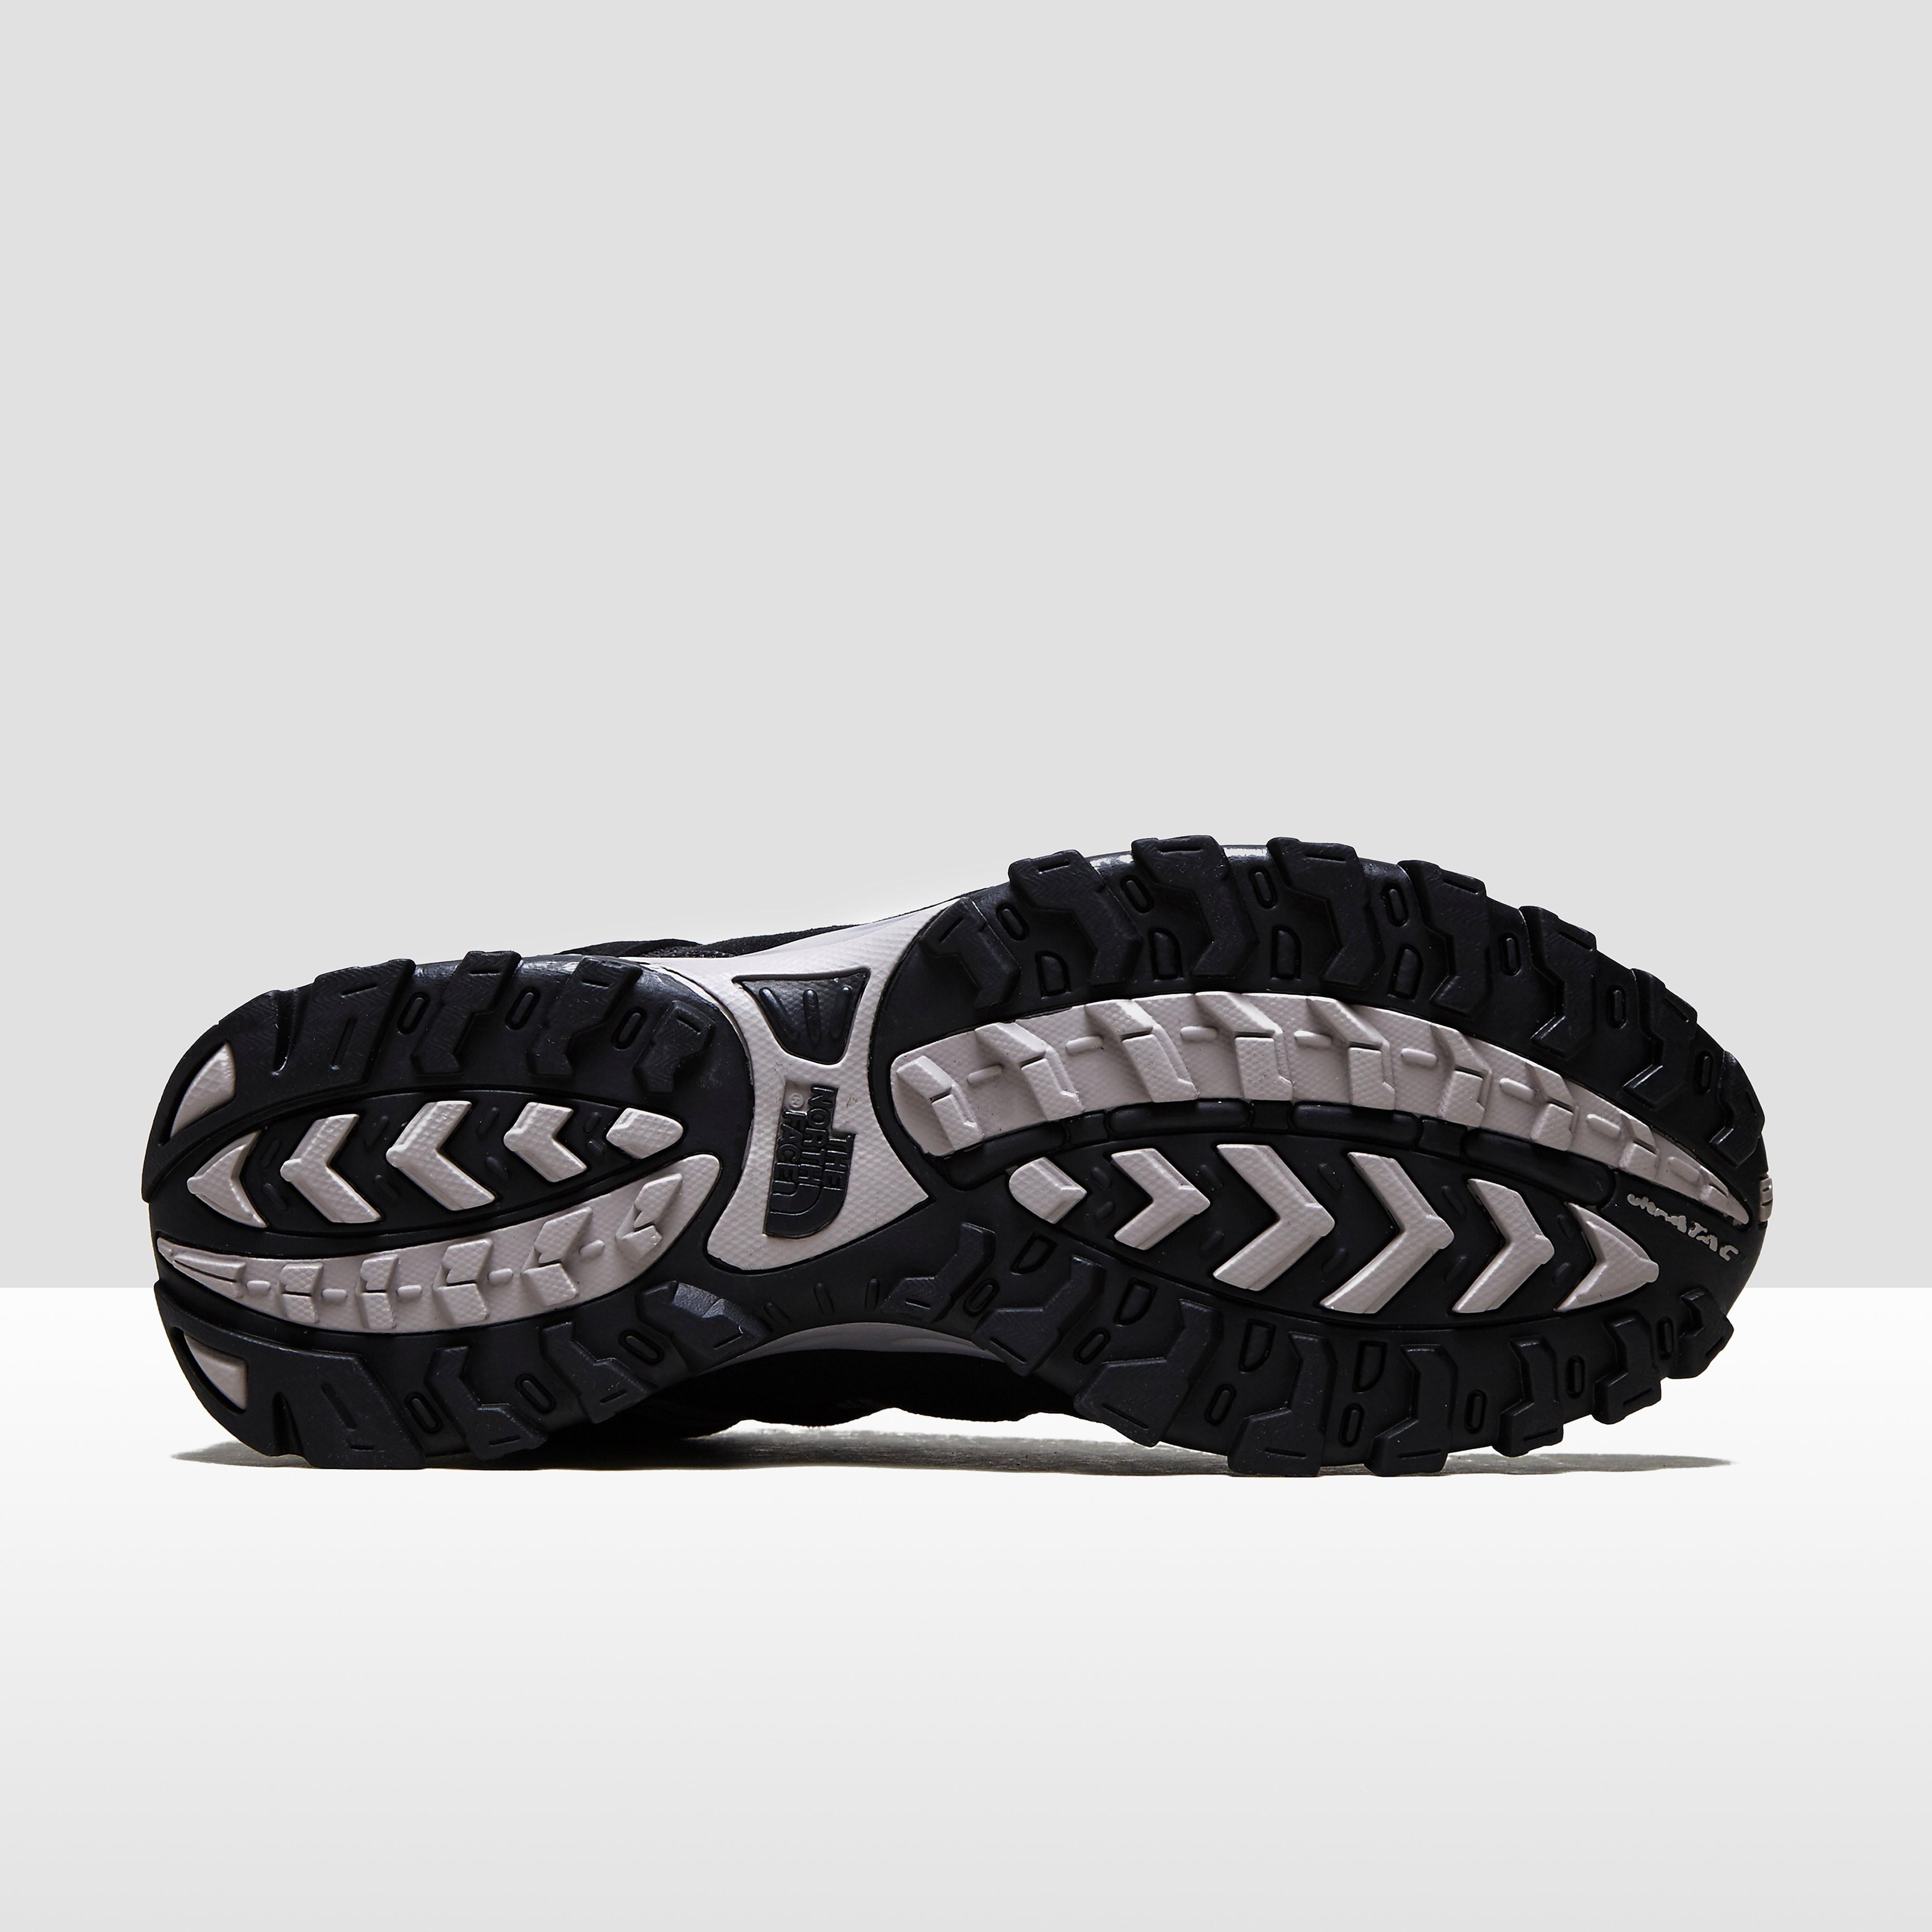 The North Face Sakura GTX Men's Walking Shoes